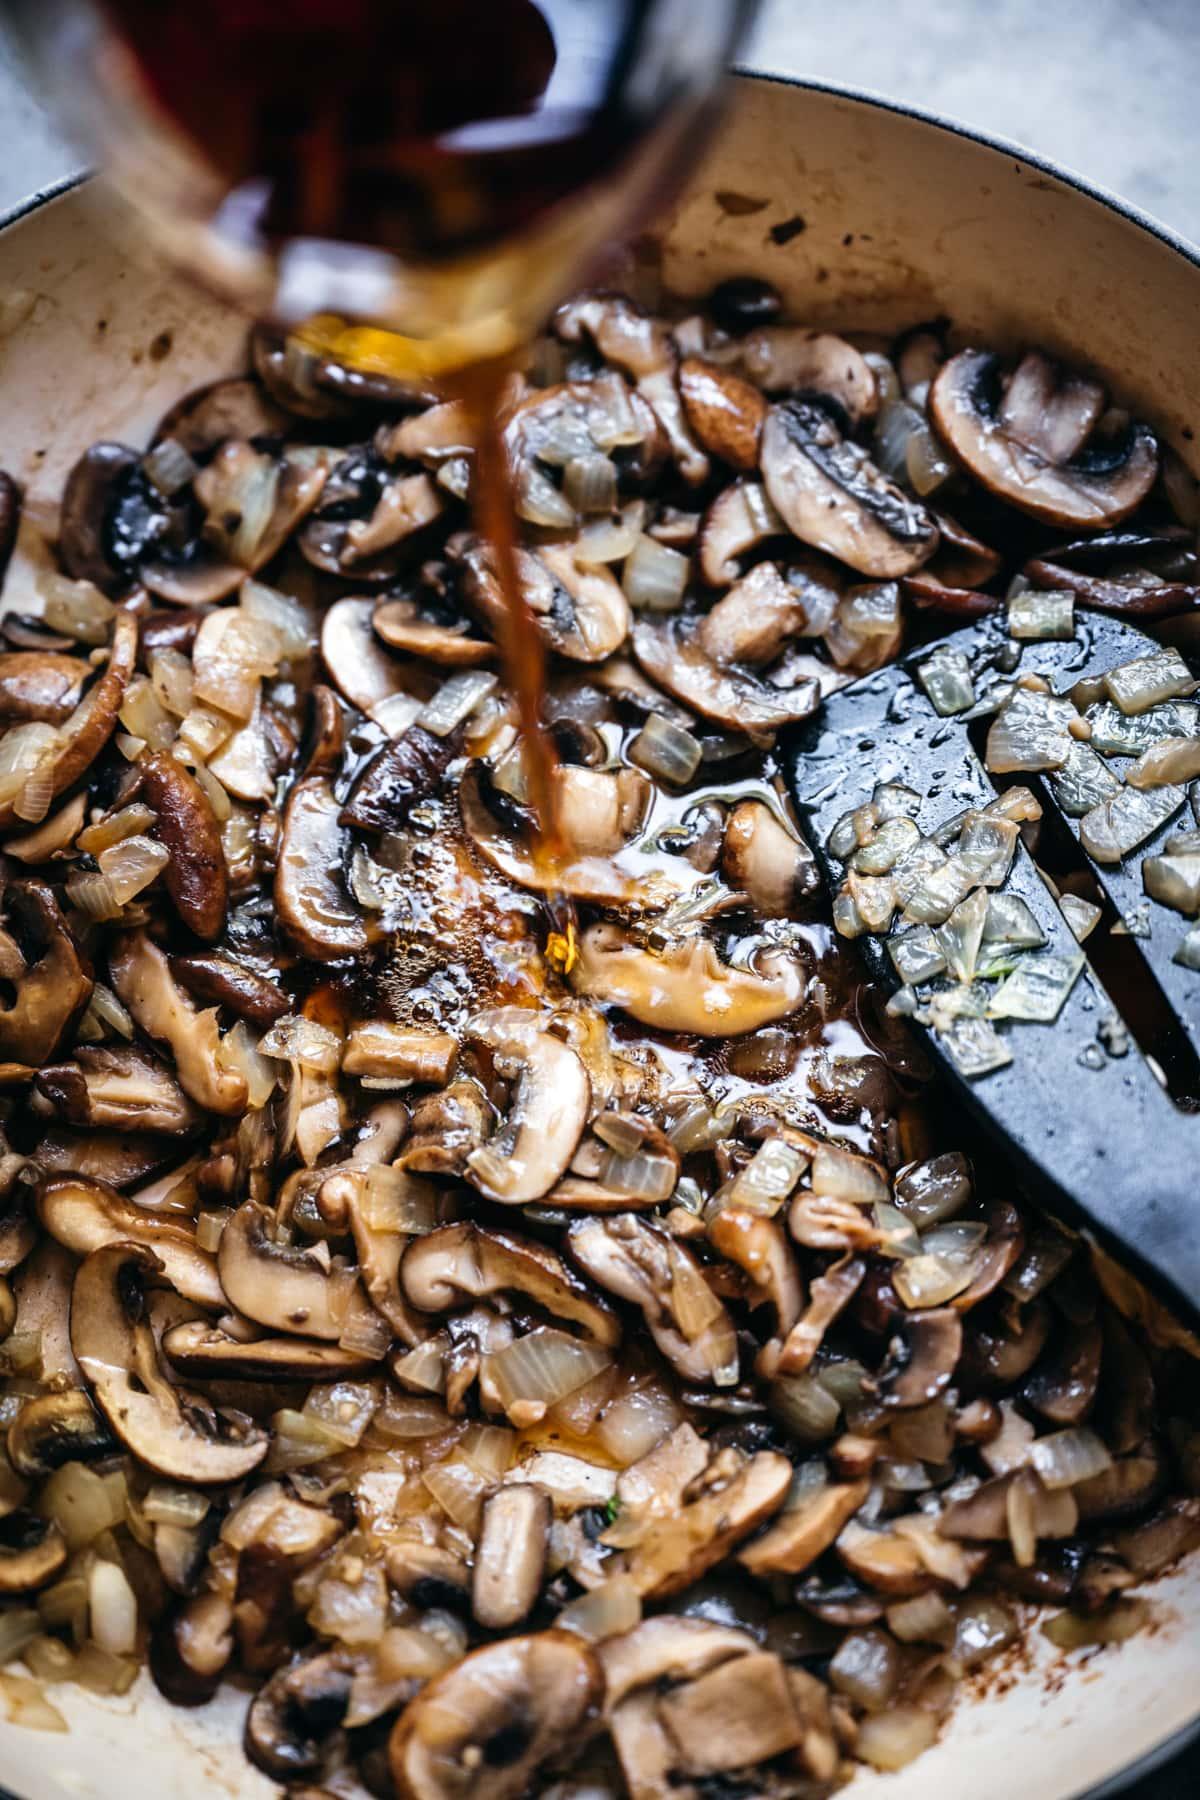 pouring marsala wine into mushroom sauce.